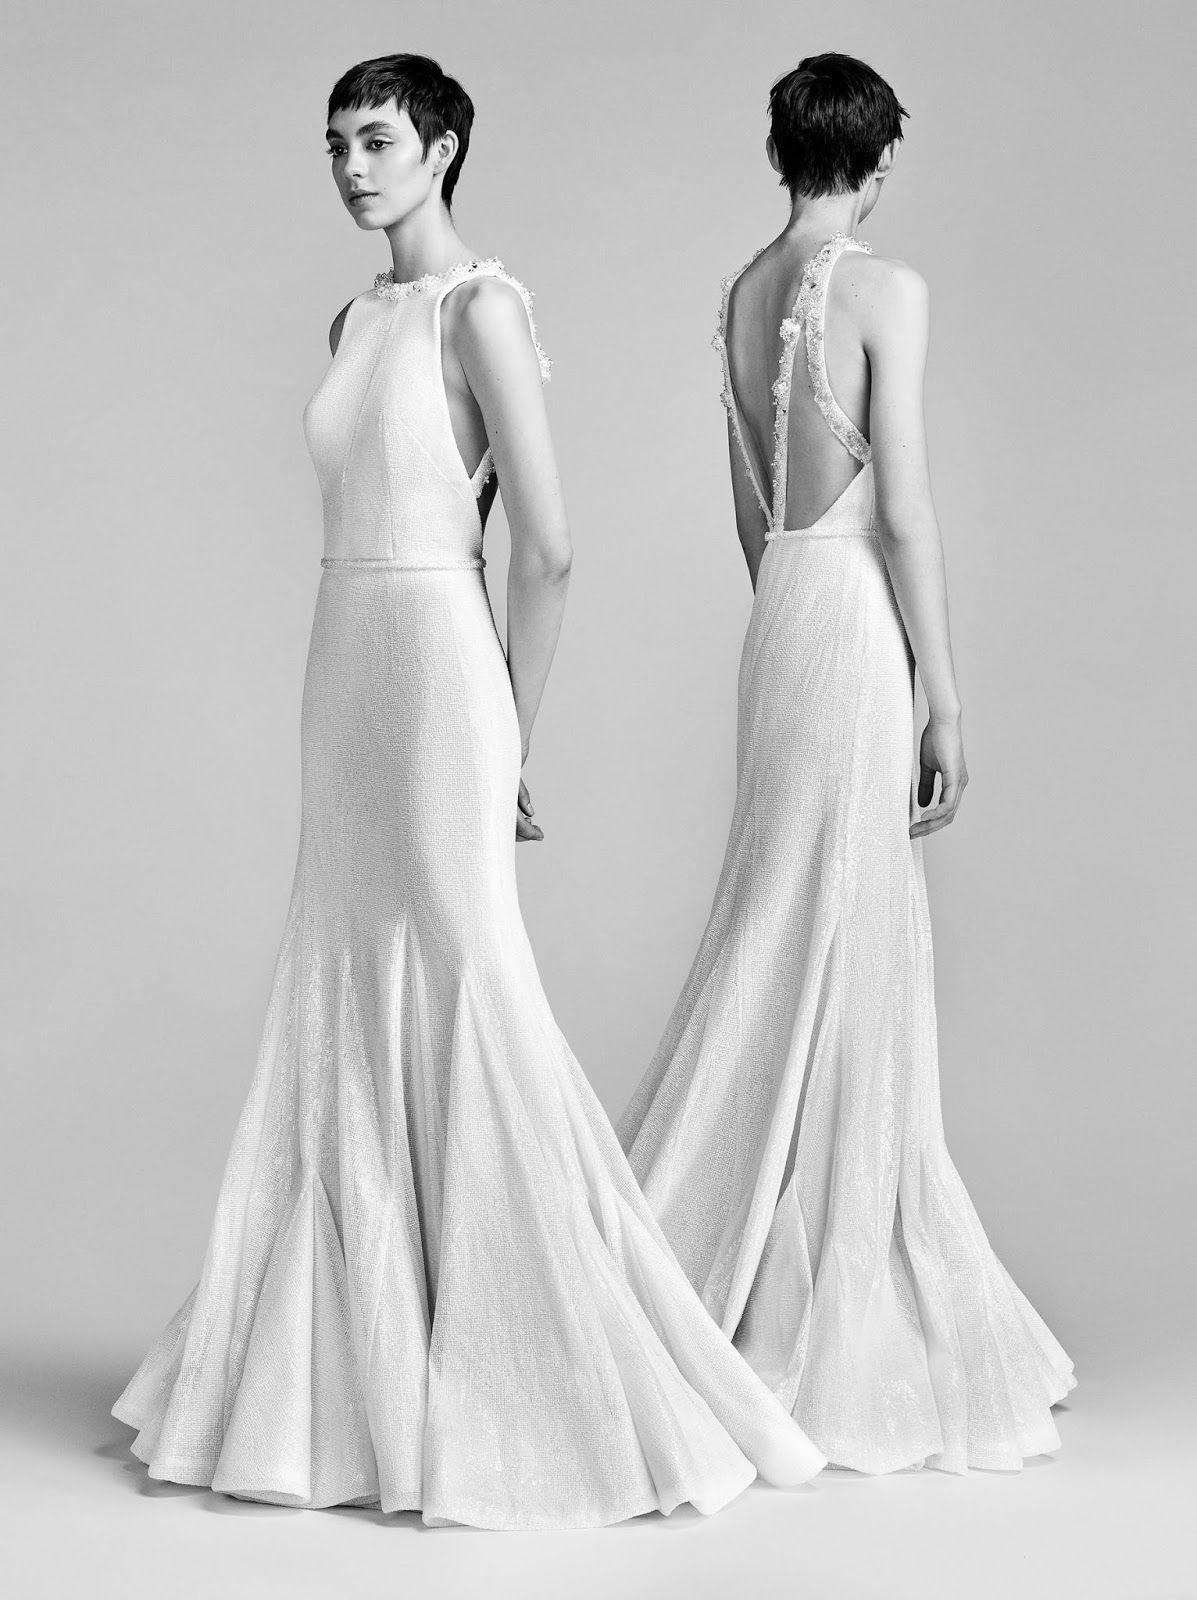 Wedding Gown Elegance: Viktor and Rolf May 3, 2017   Pinterest ...